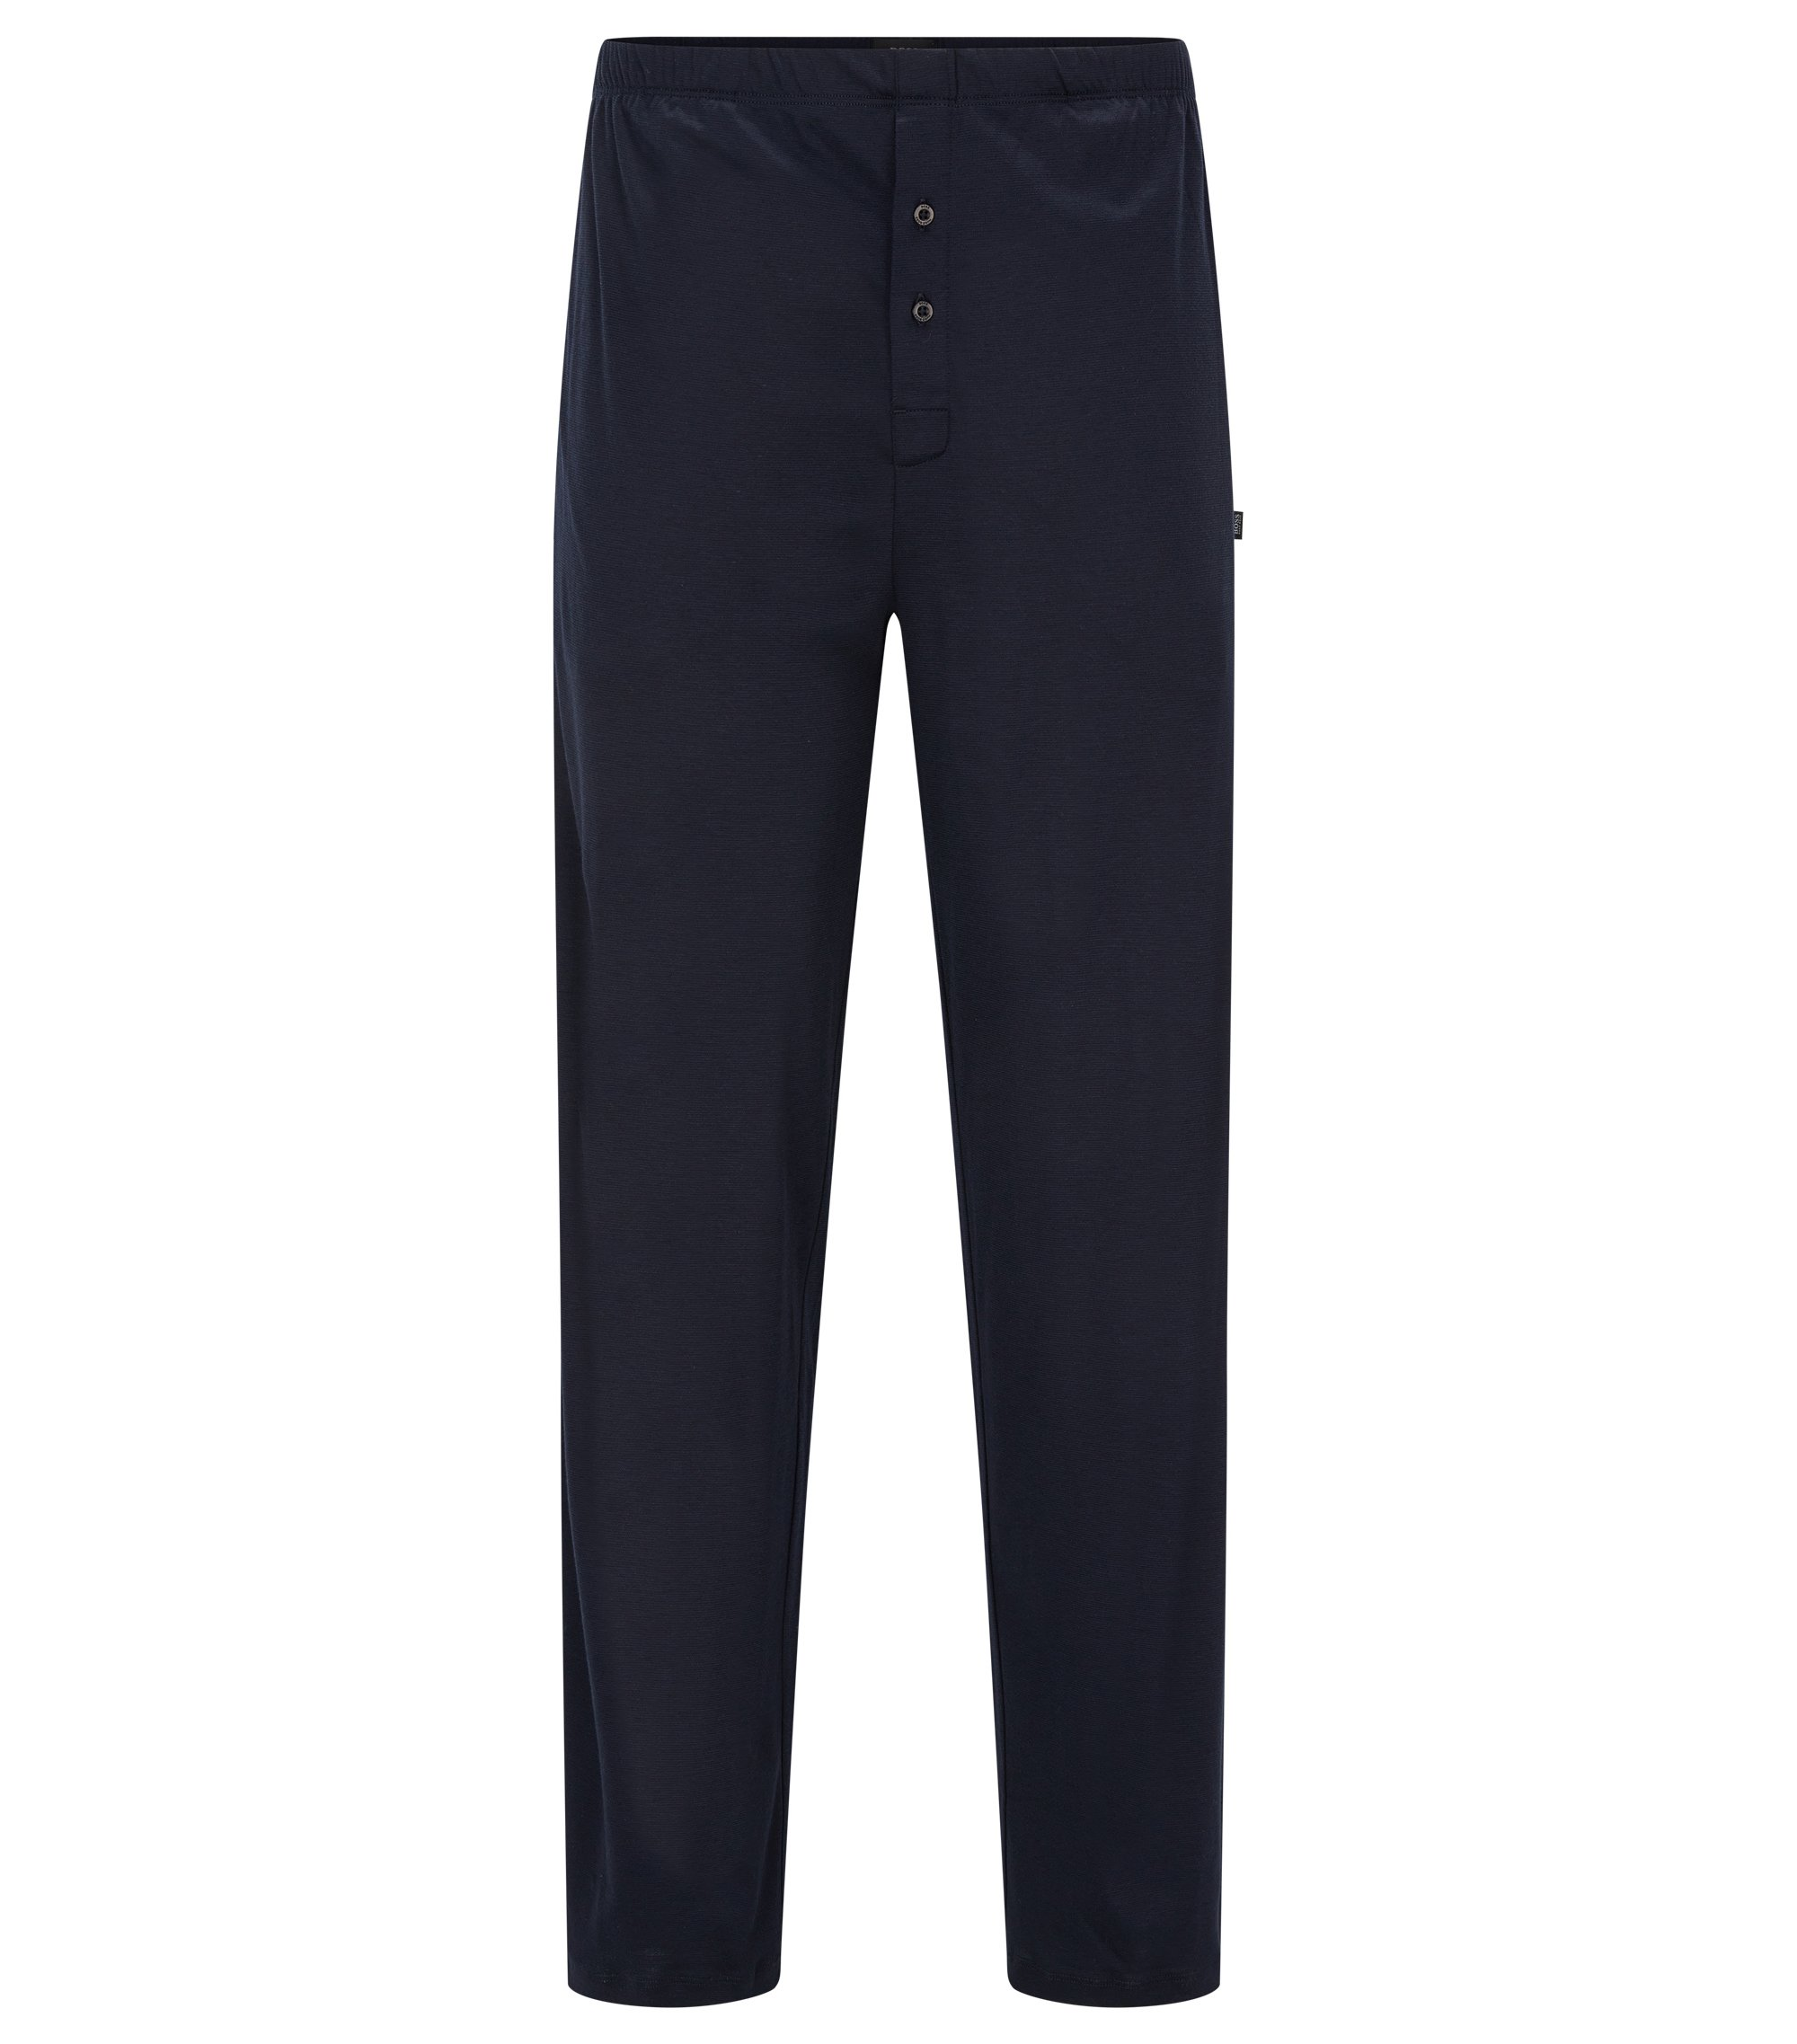 Stretch Cotton Pant | Long Pant CW, Dark Blue